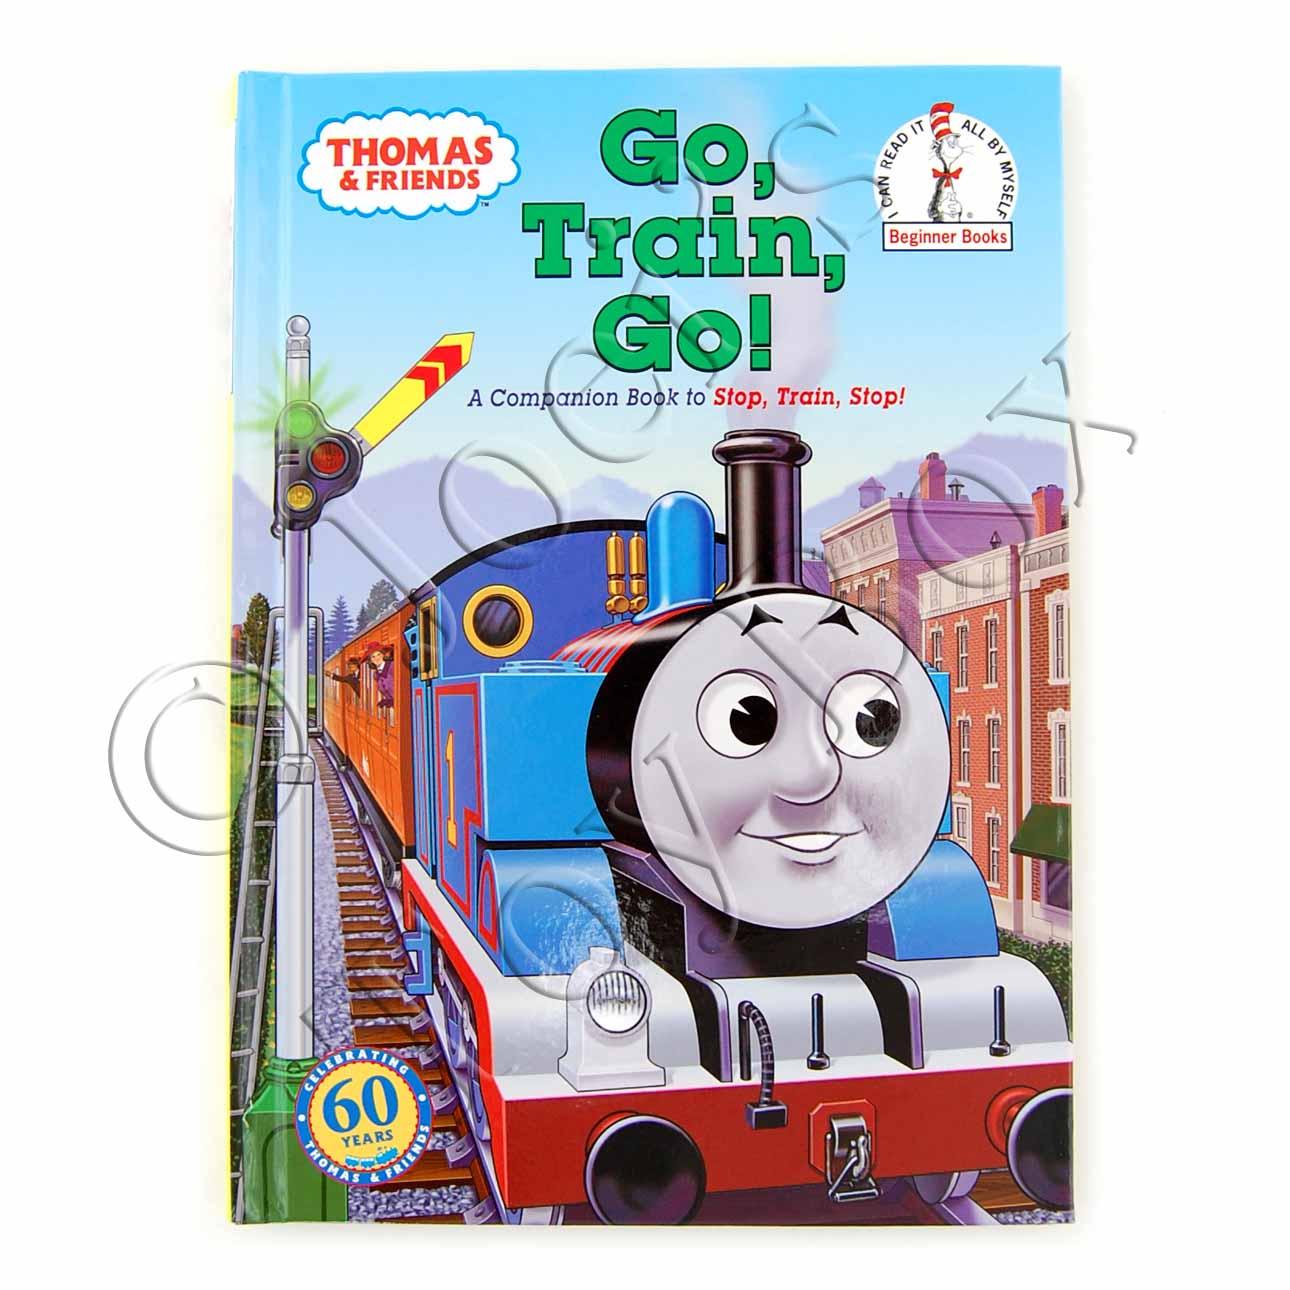 Go Train Go based on The Railway Series by Rev W Awdry